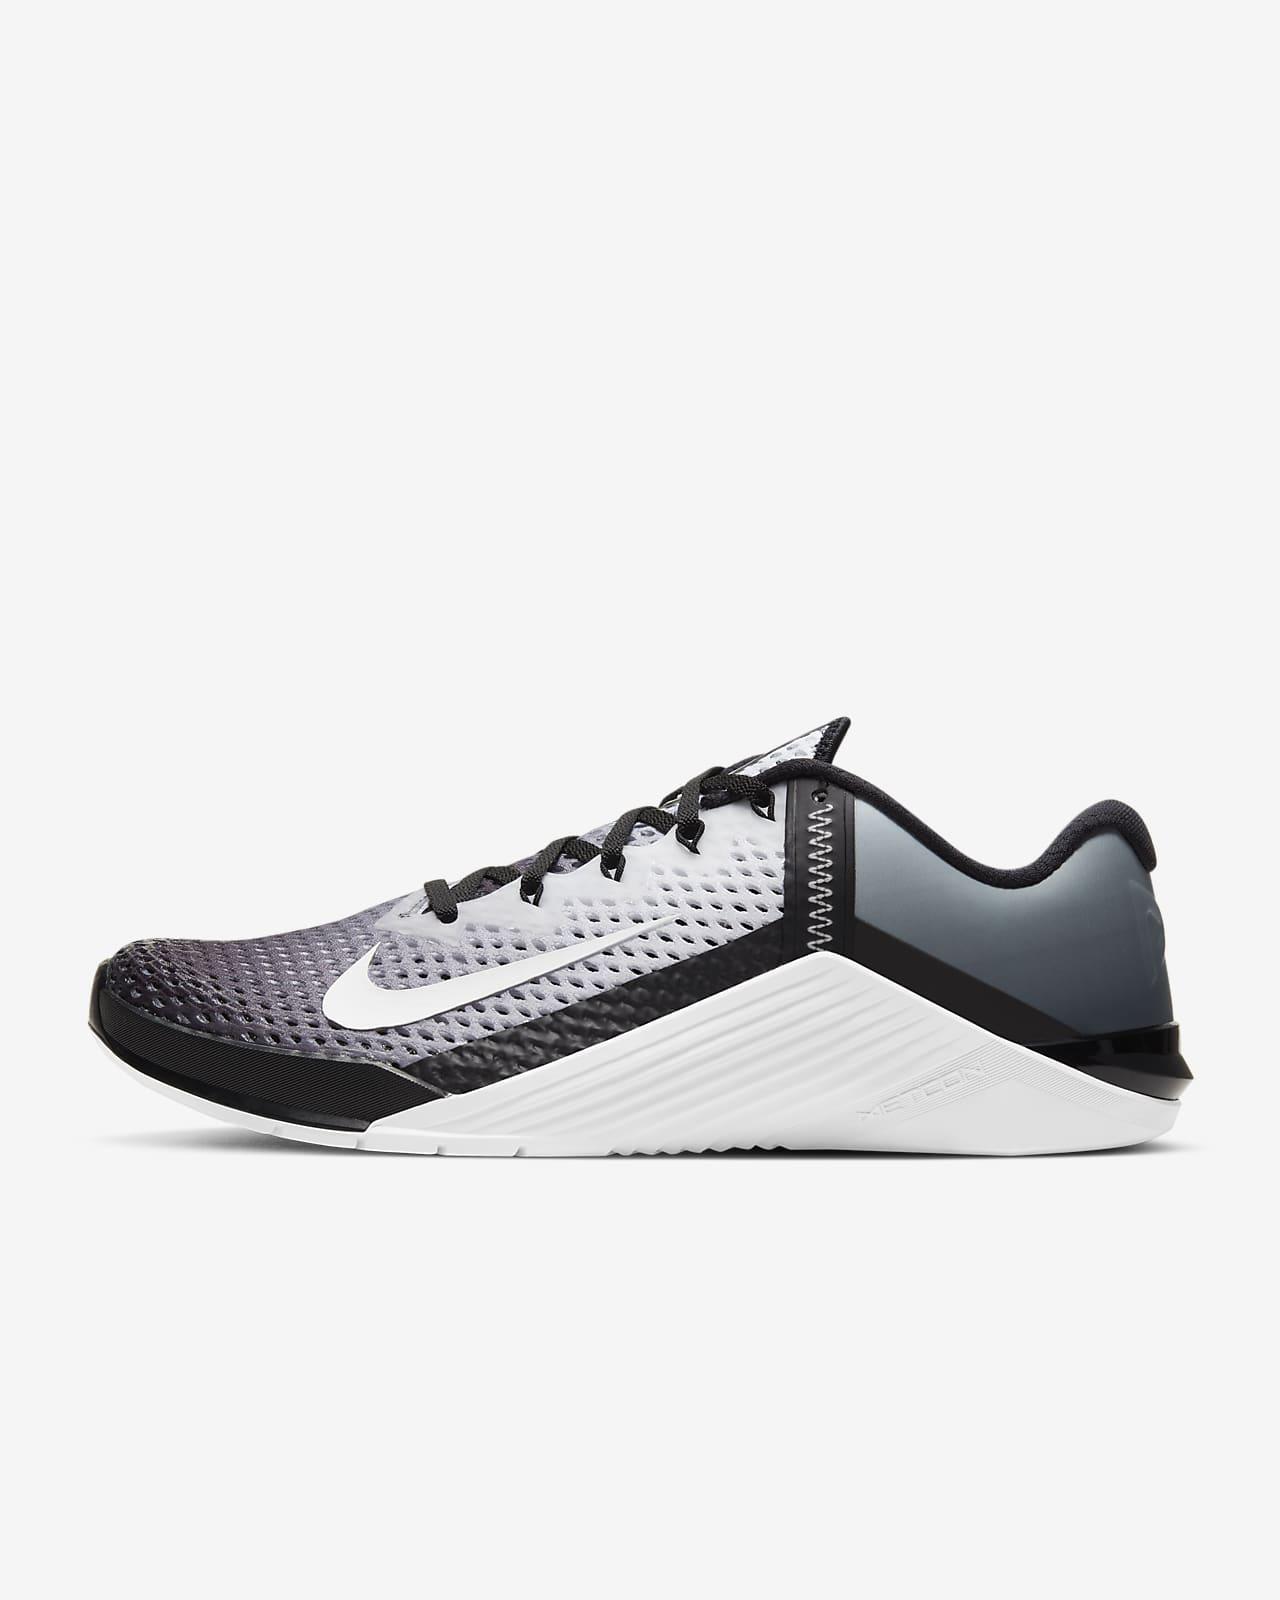 Nike Metcon 6 Training Shoe